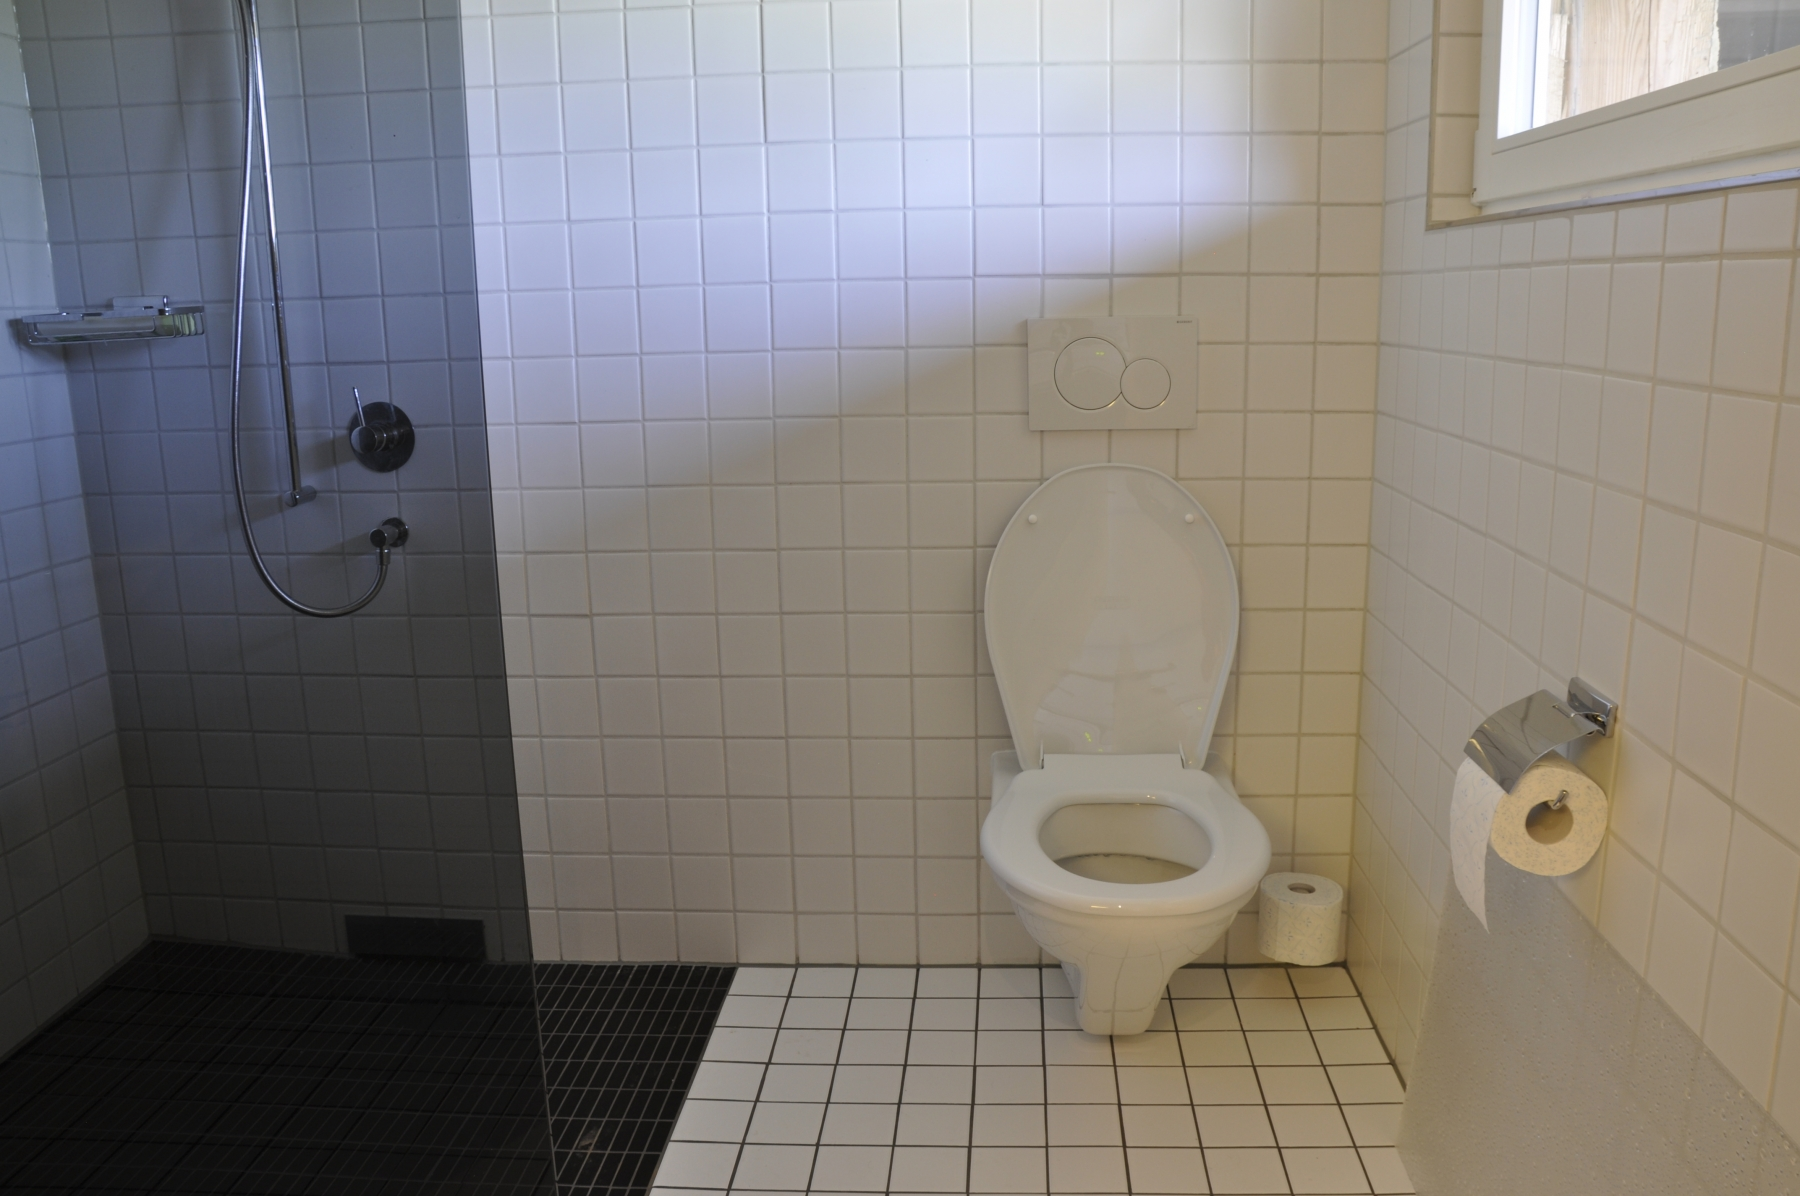 Toilette-dusche